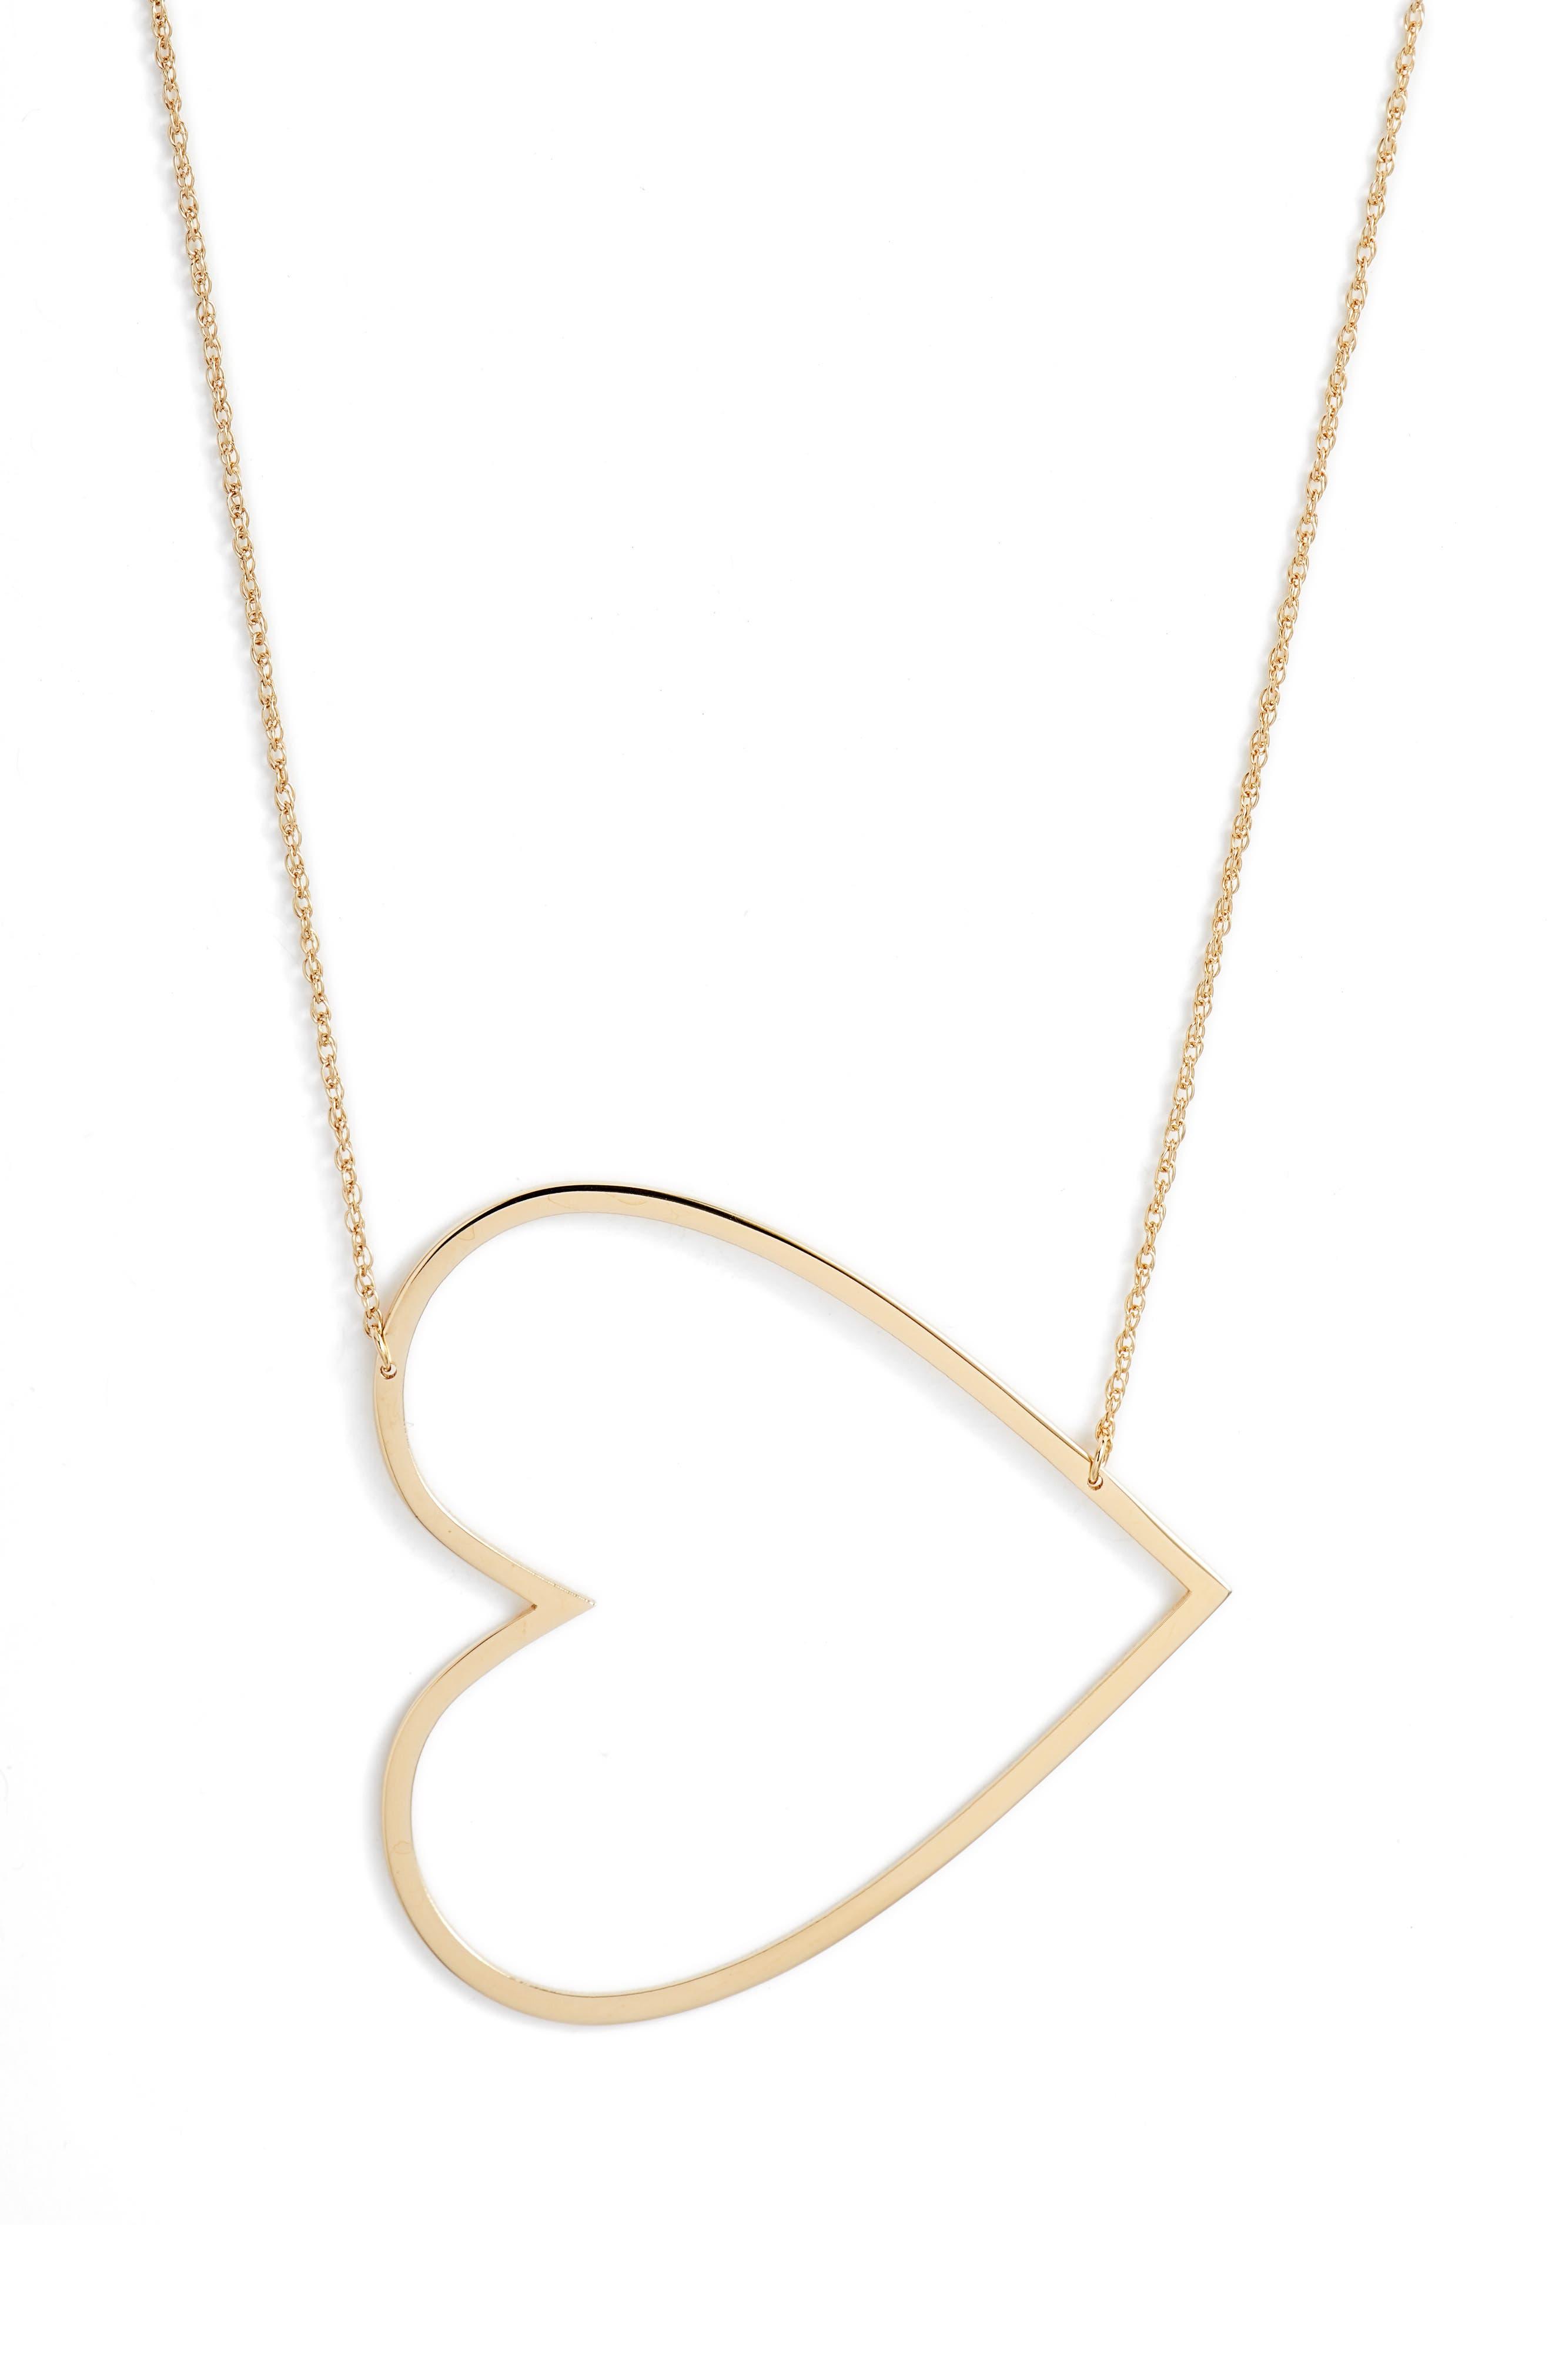 JENNIFER ZEUNER, Marissa Heart Pendant Necklace, Main thumbnail 1, color, YELLOW VERMEIL